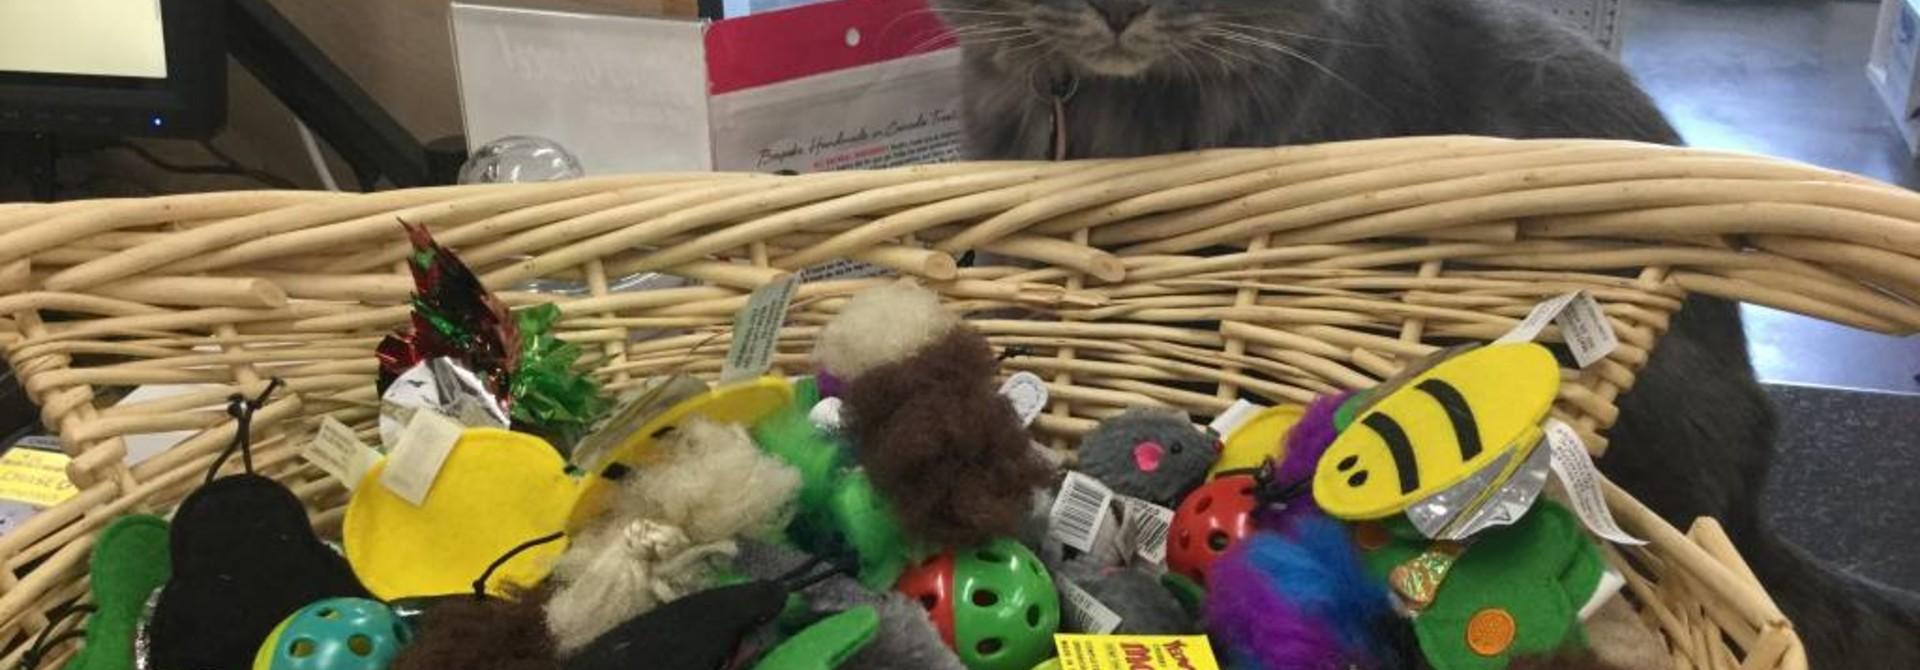 Harriet's Favorite Cat Toys